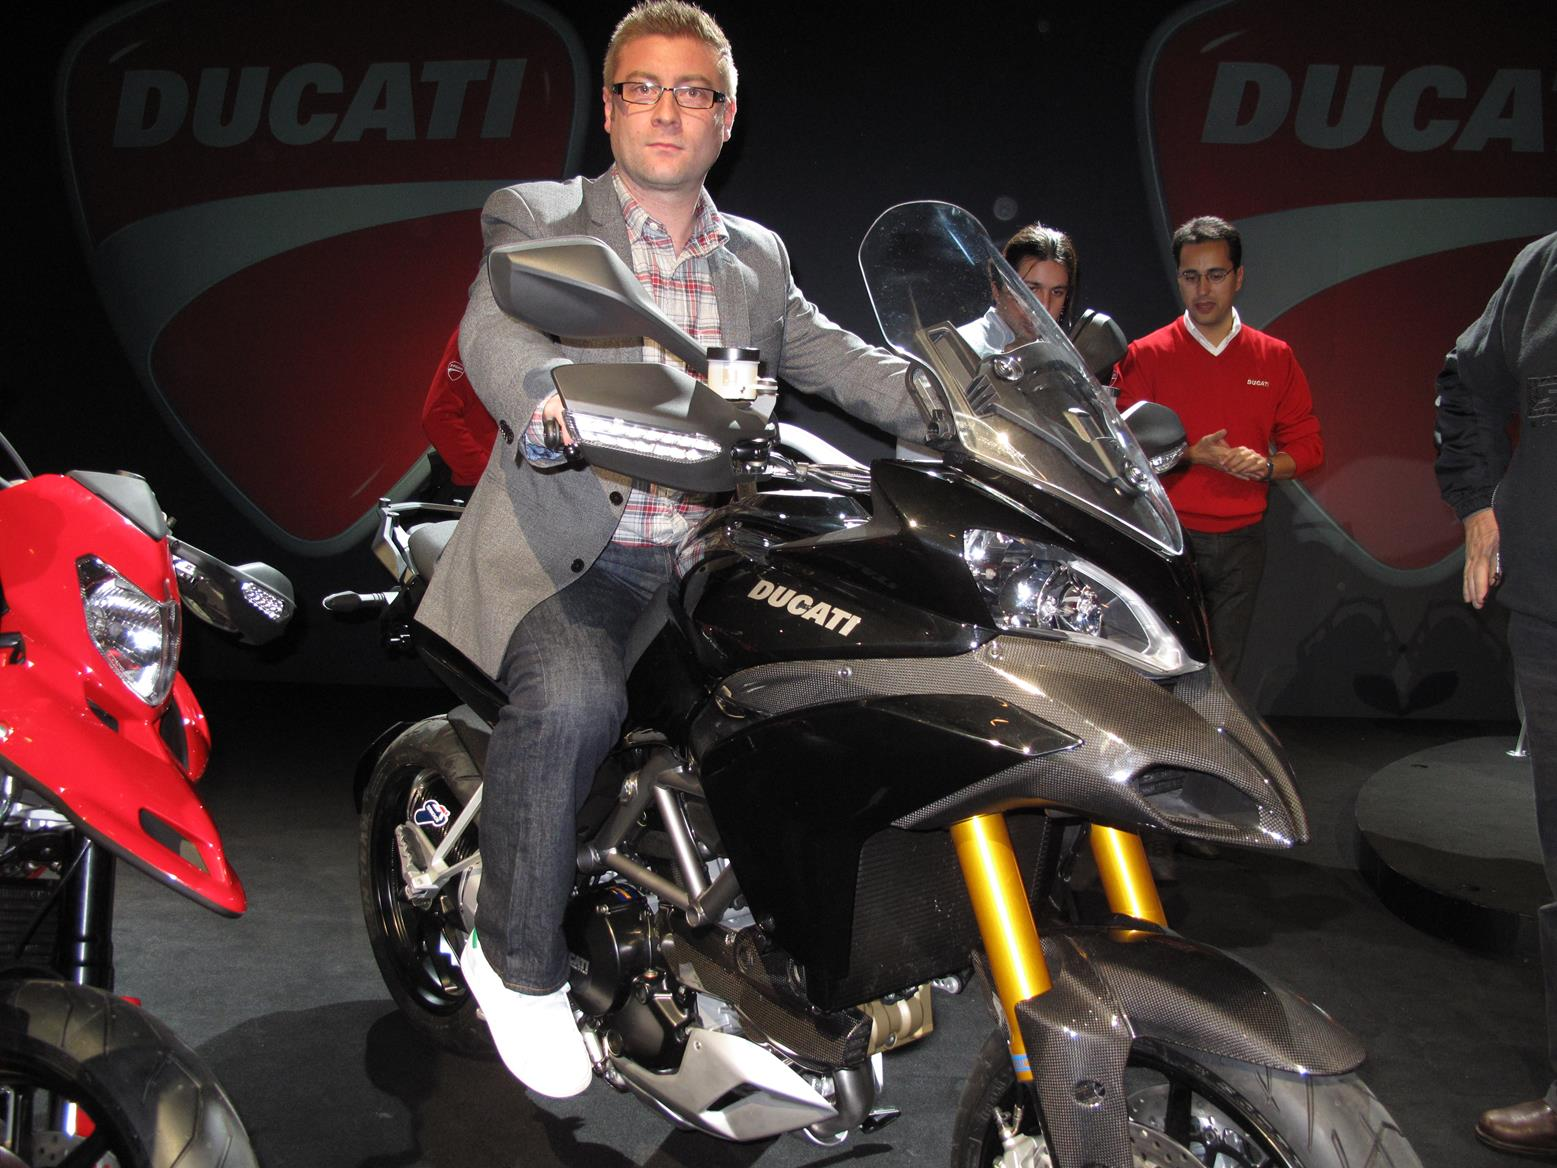 milan show: 2010 ducati multistrada 1200 to cost £10,995   mcn